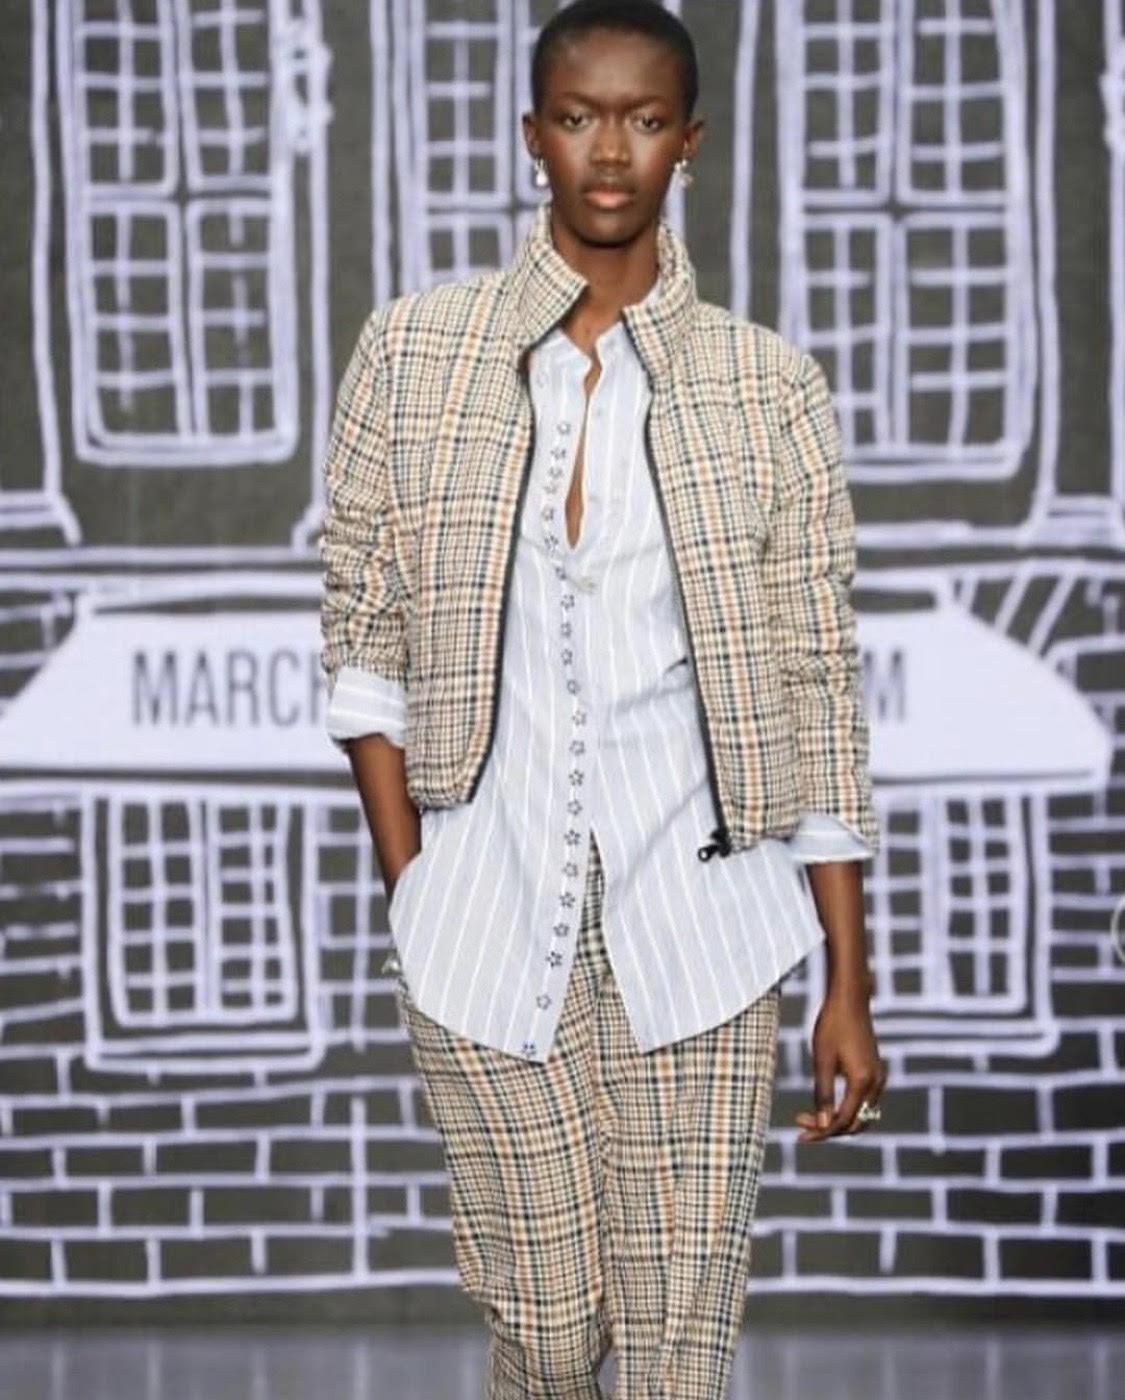 Fashion Week Maison 365 2019